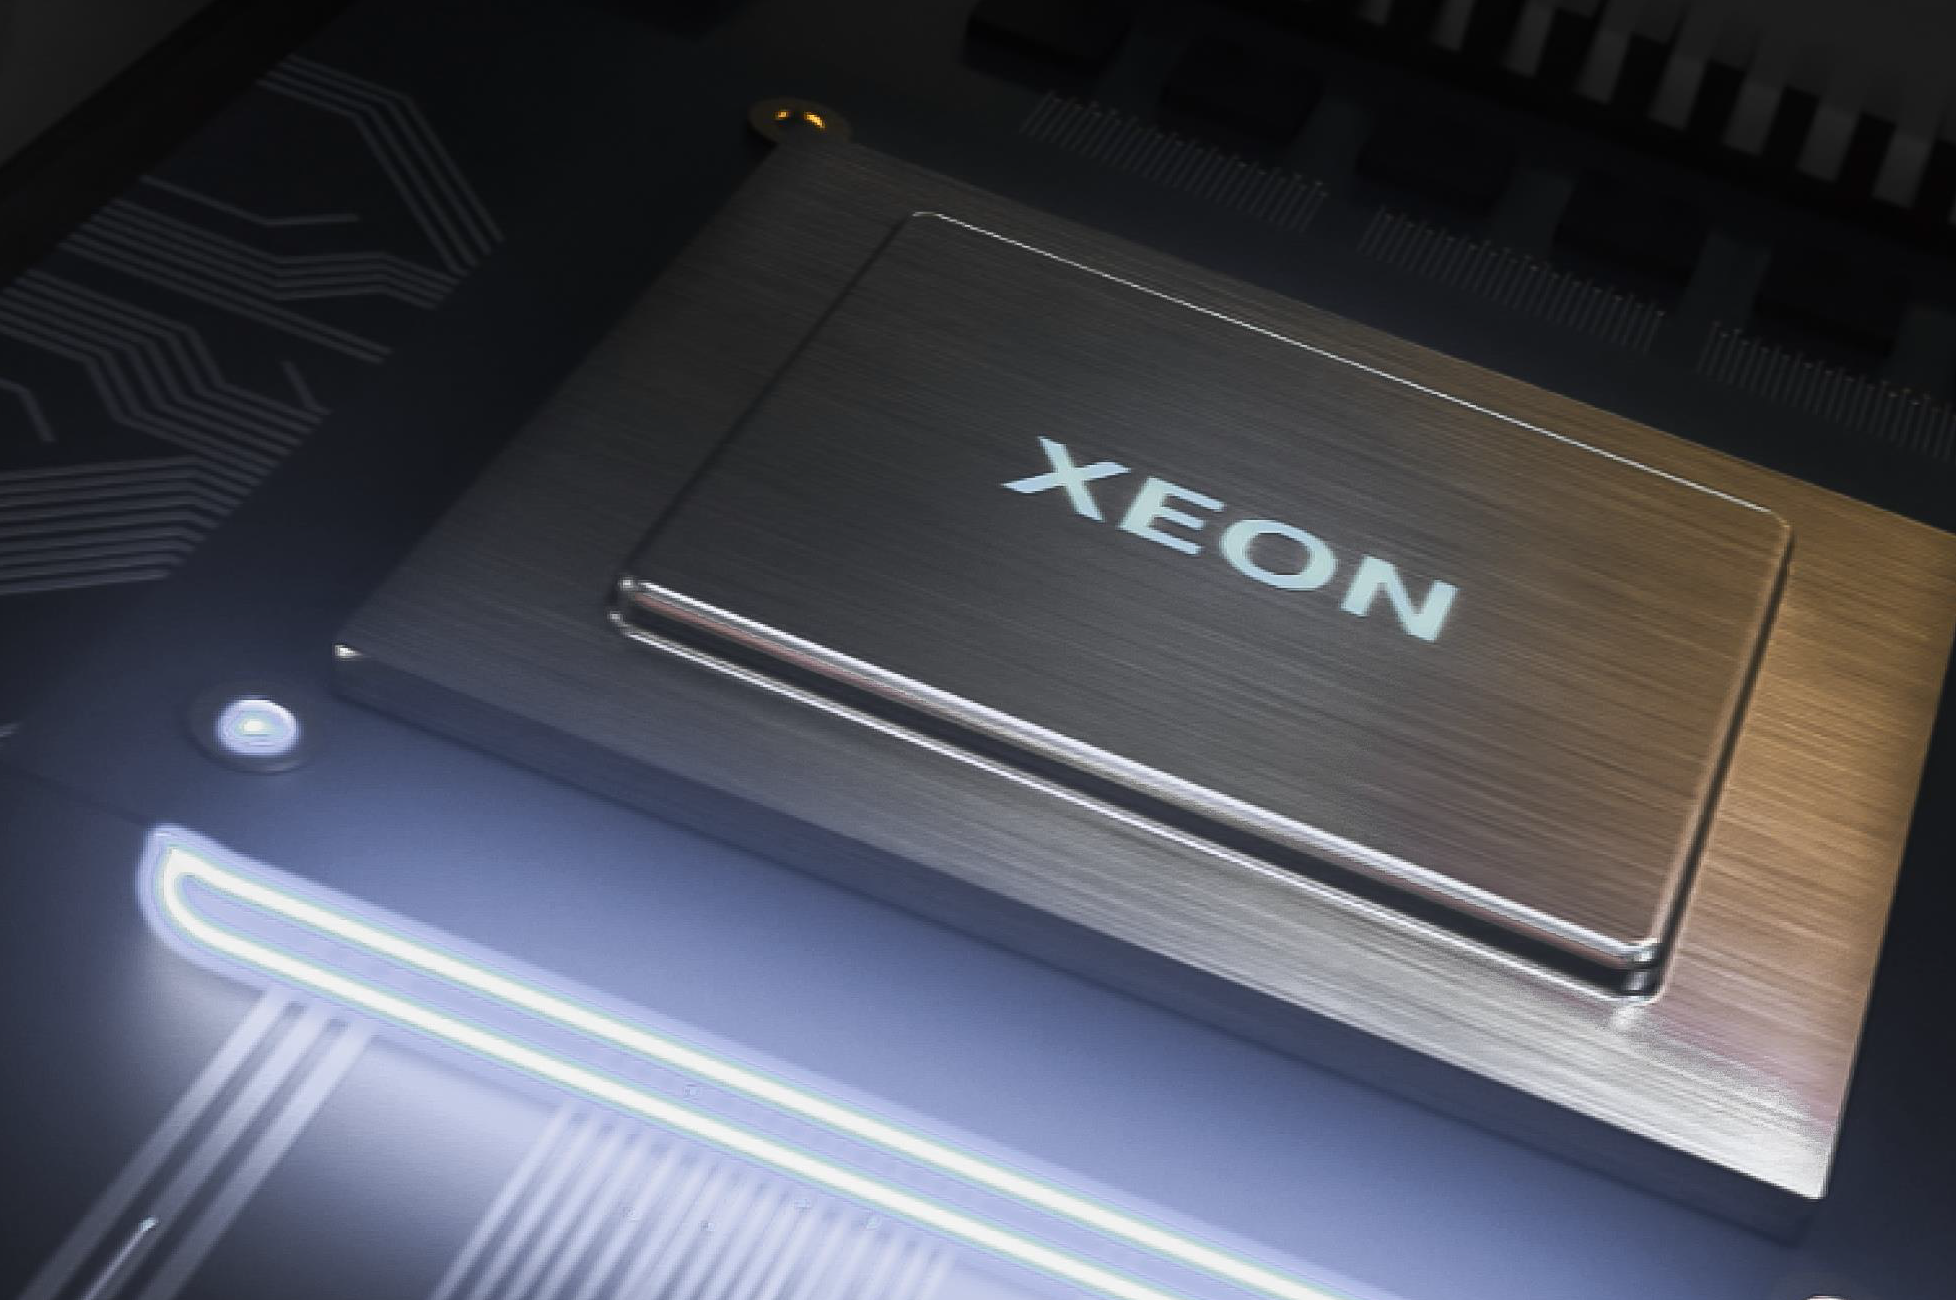 Intel Xeon Sapphire Rapids